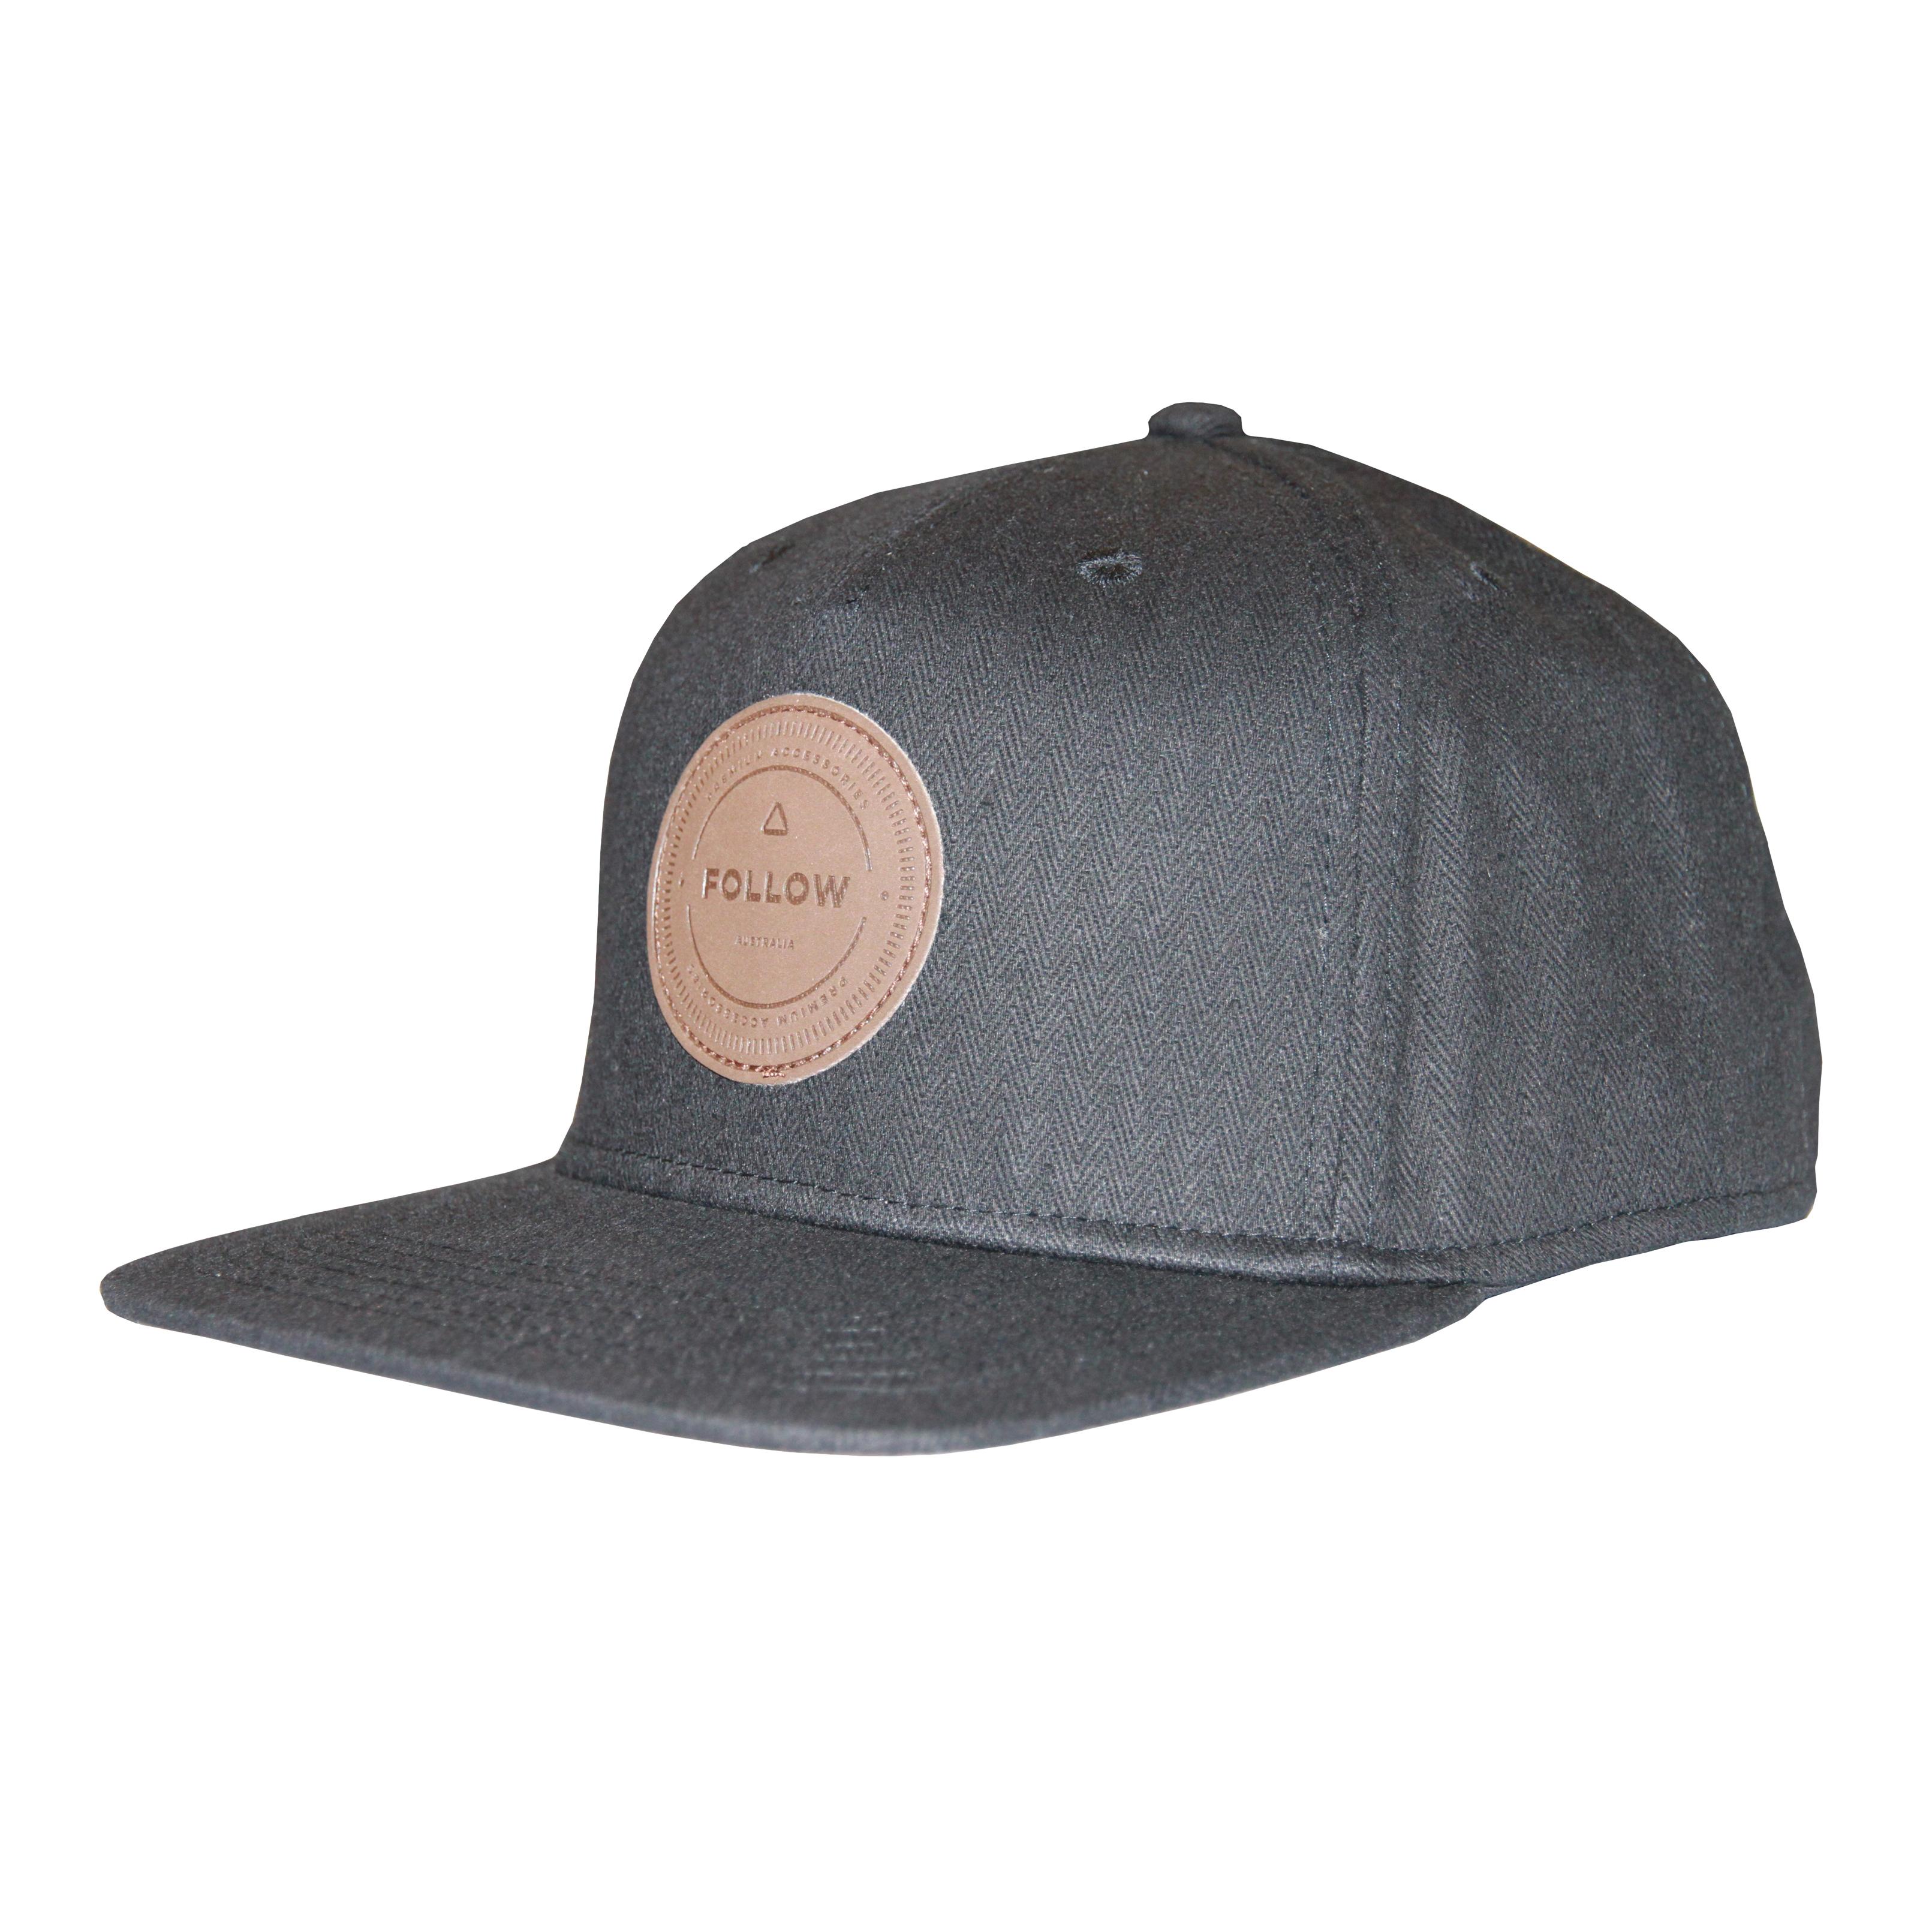 STAMP S/B  MENS CAP - BLACKOSFM FOLLOW 2016